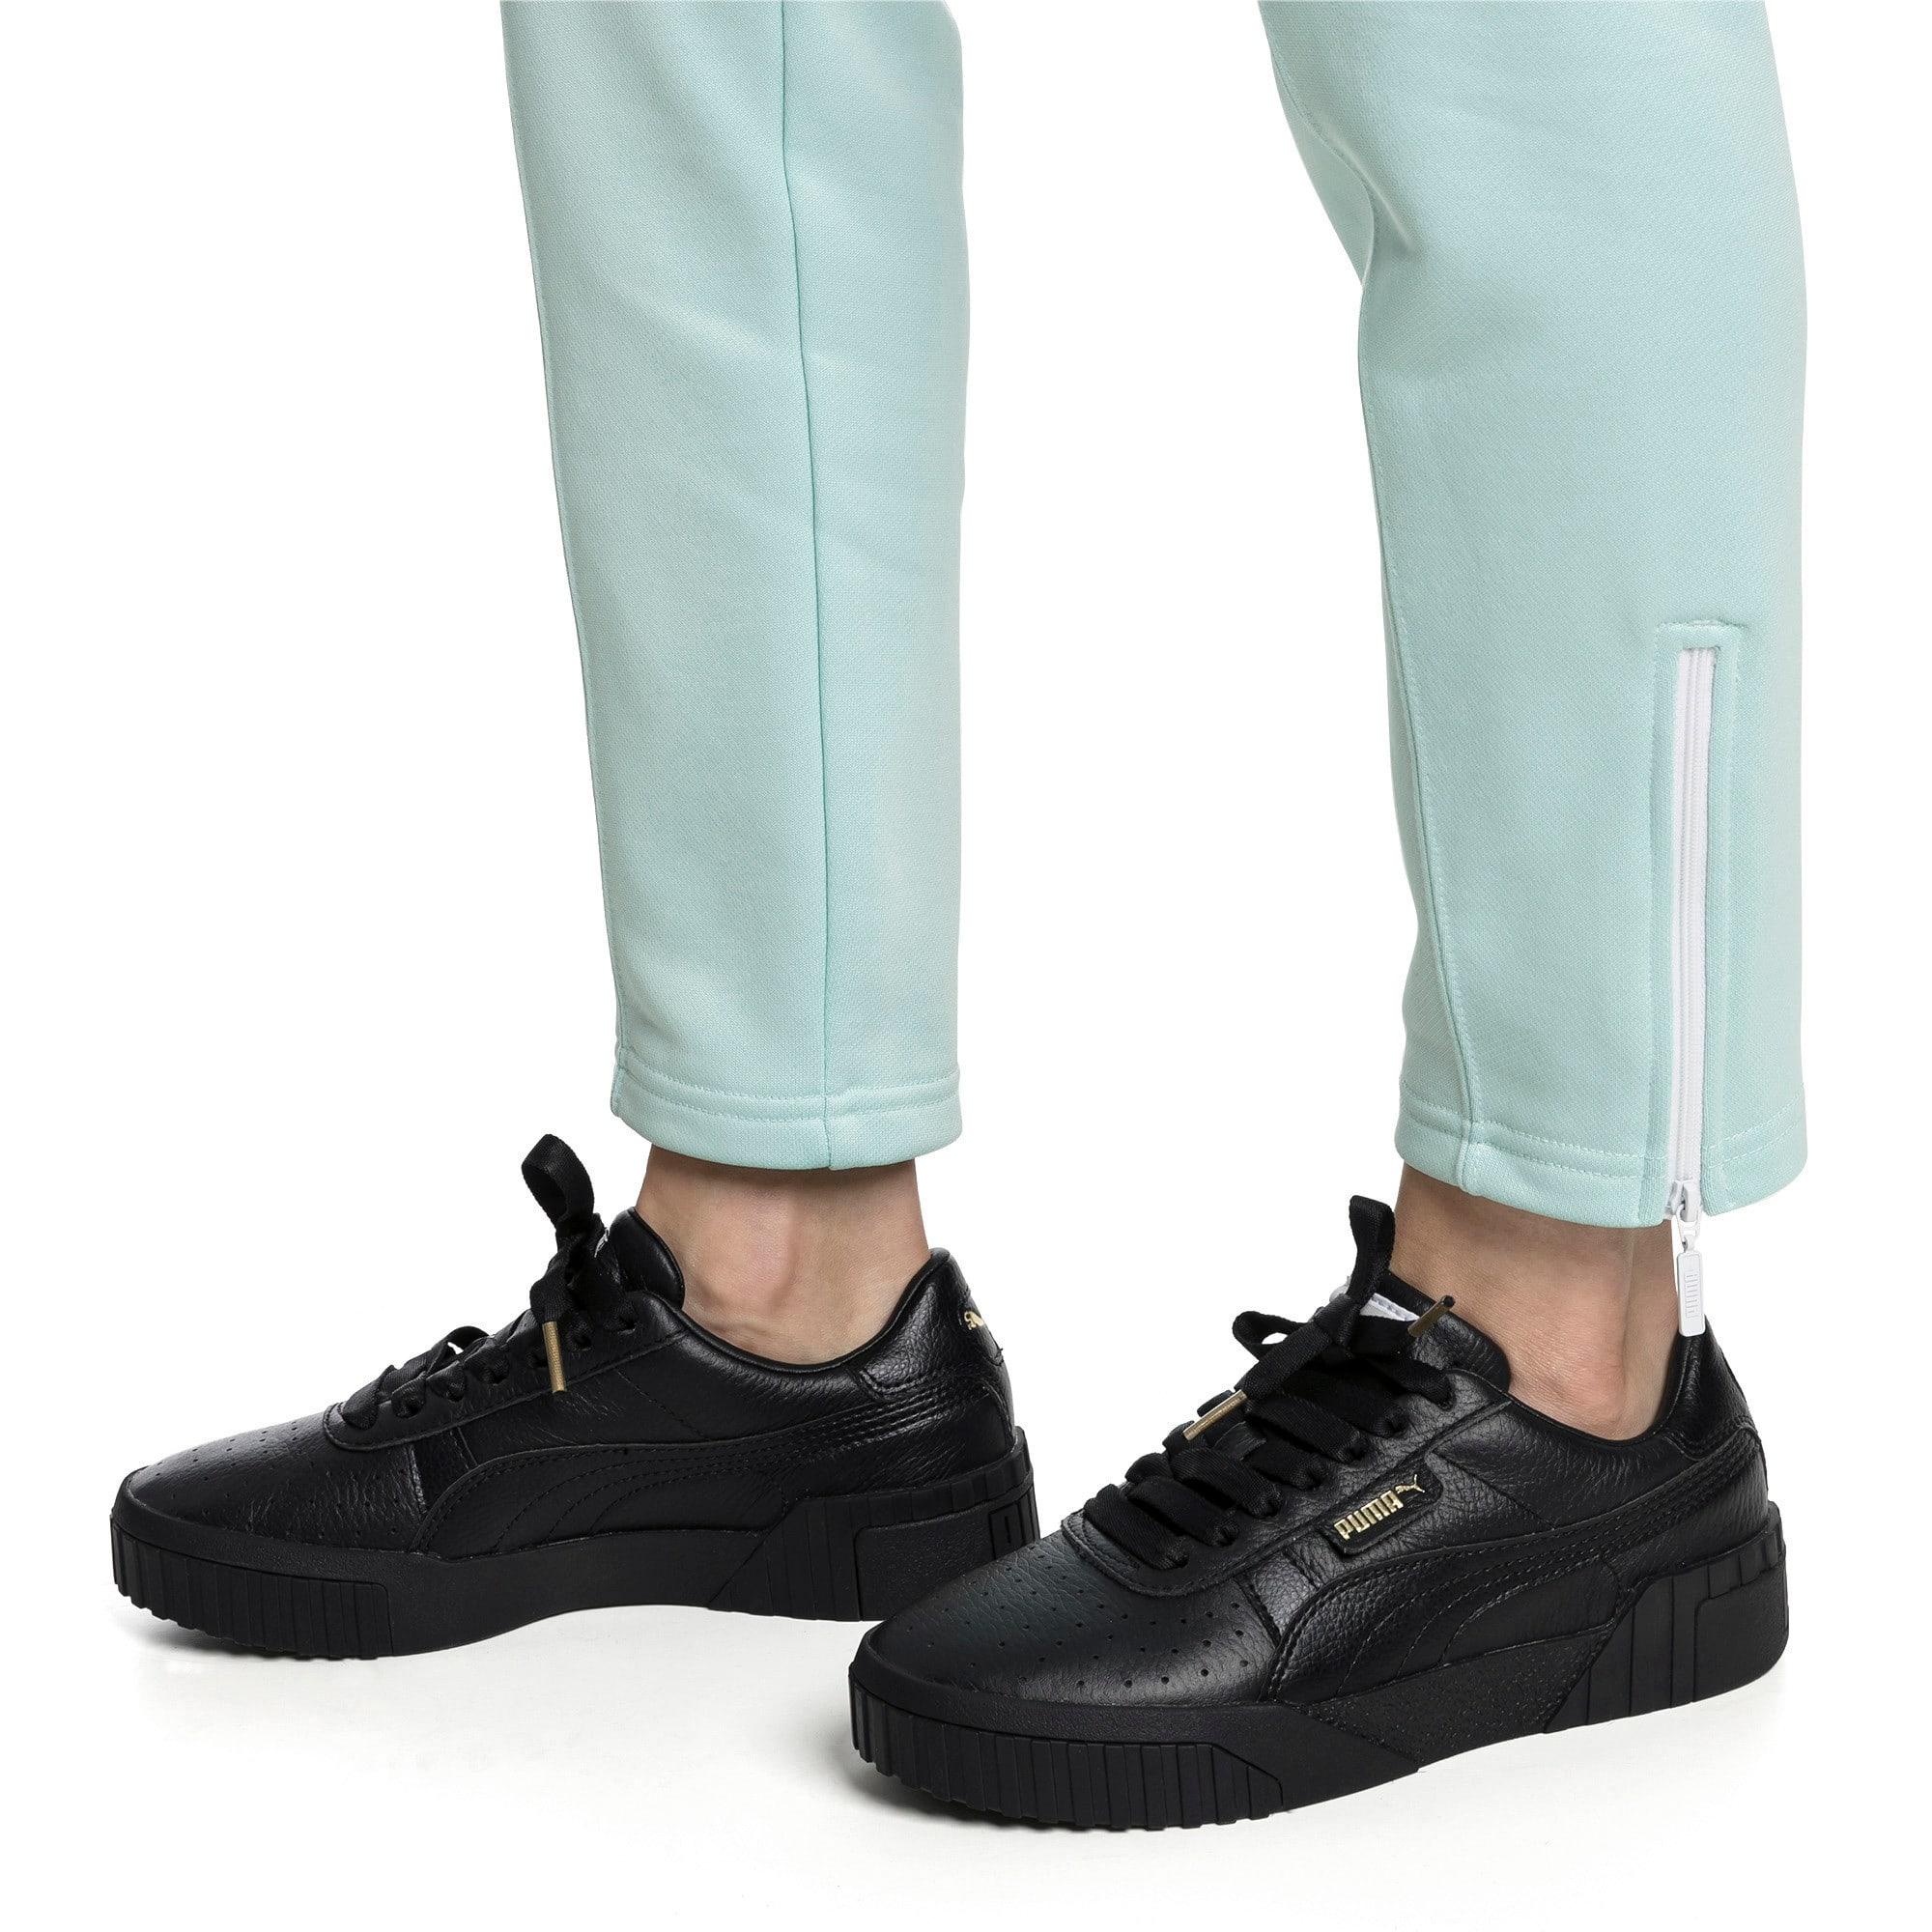 Thumbnail 2 of Sneakers Cali donna, Puma Black-Puma Black, medium